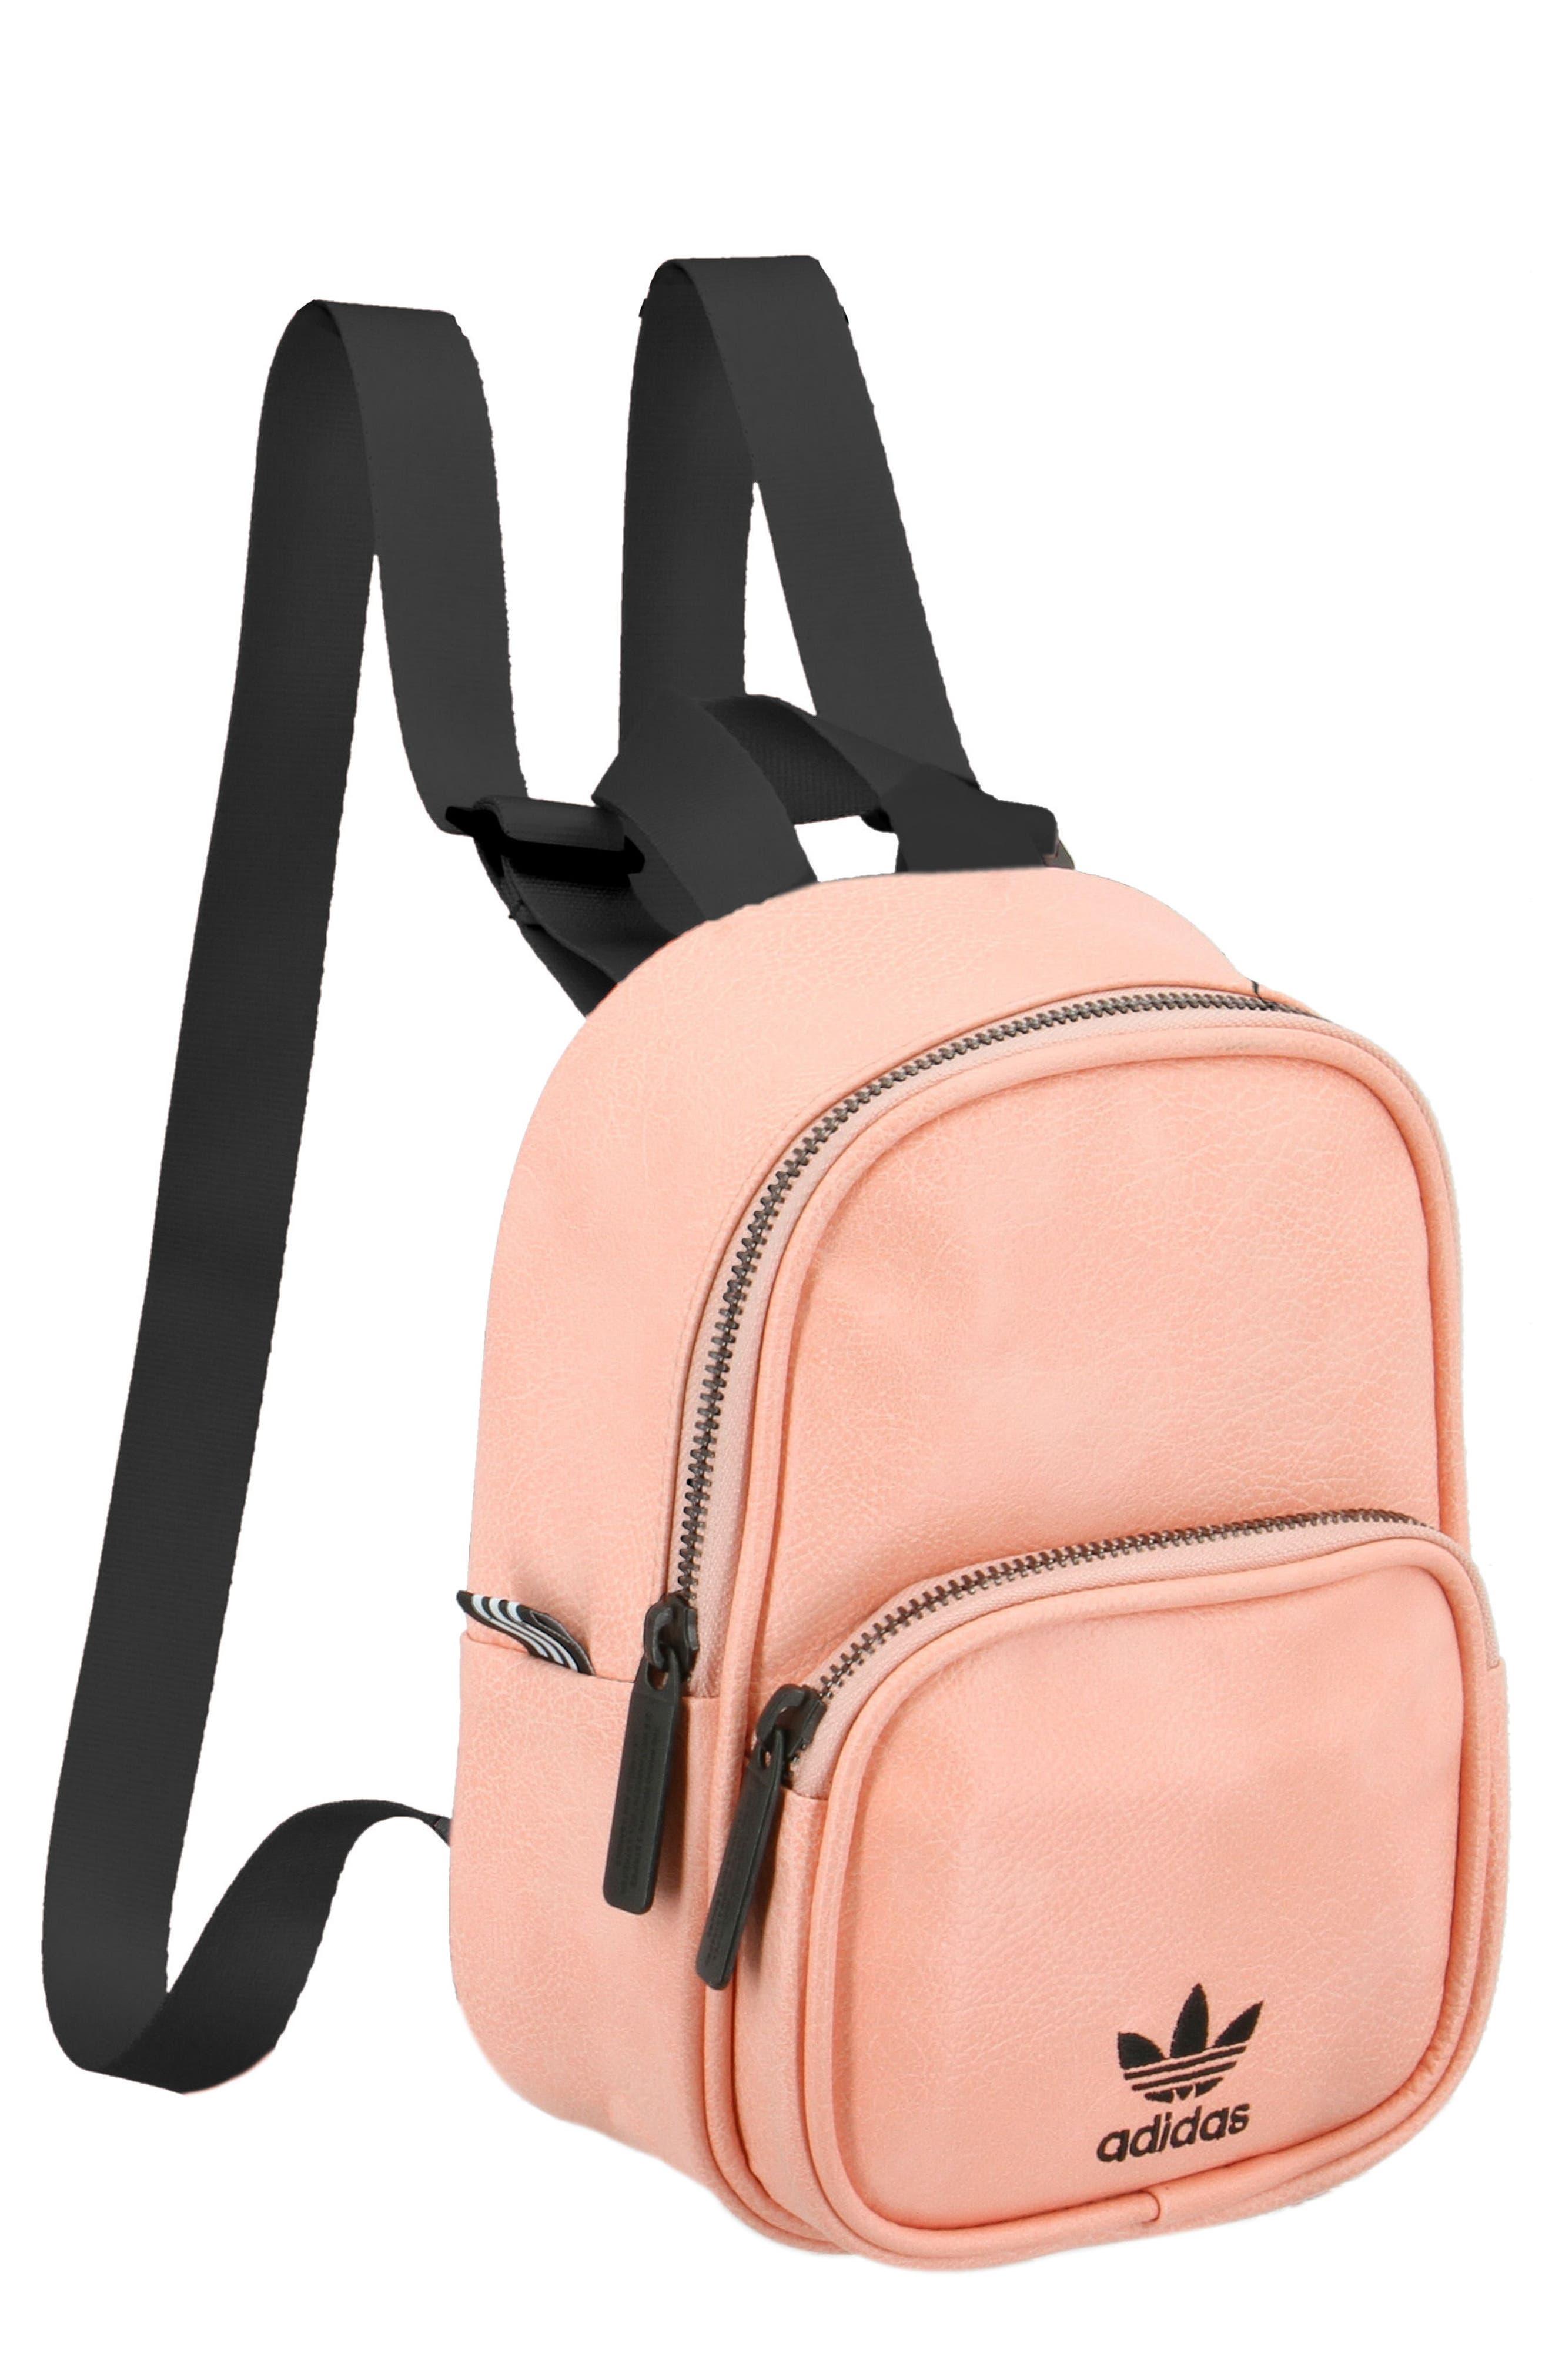 Adidas Originals Mini Backpack - Pink